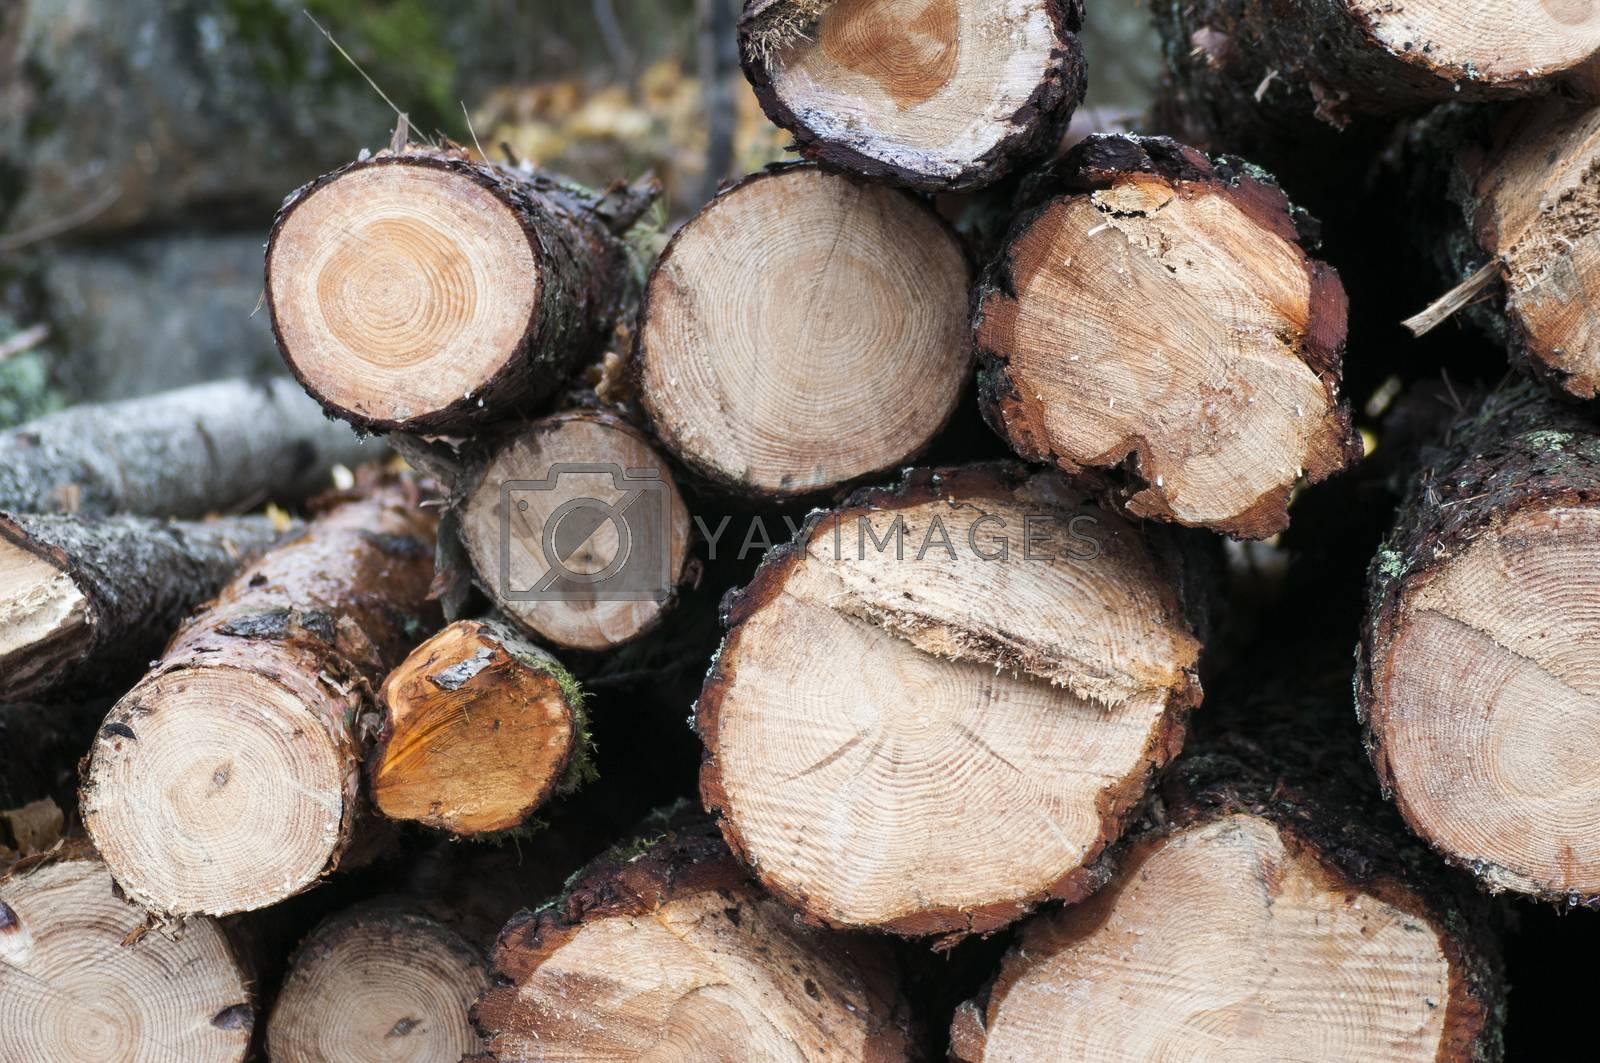 Timber Log Stack by ockra